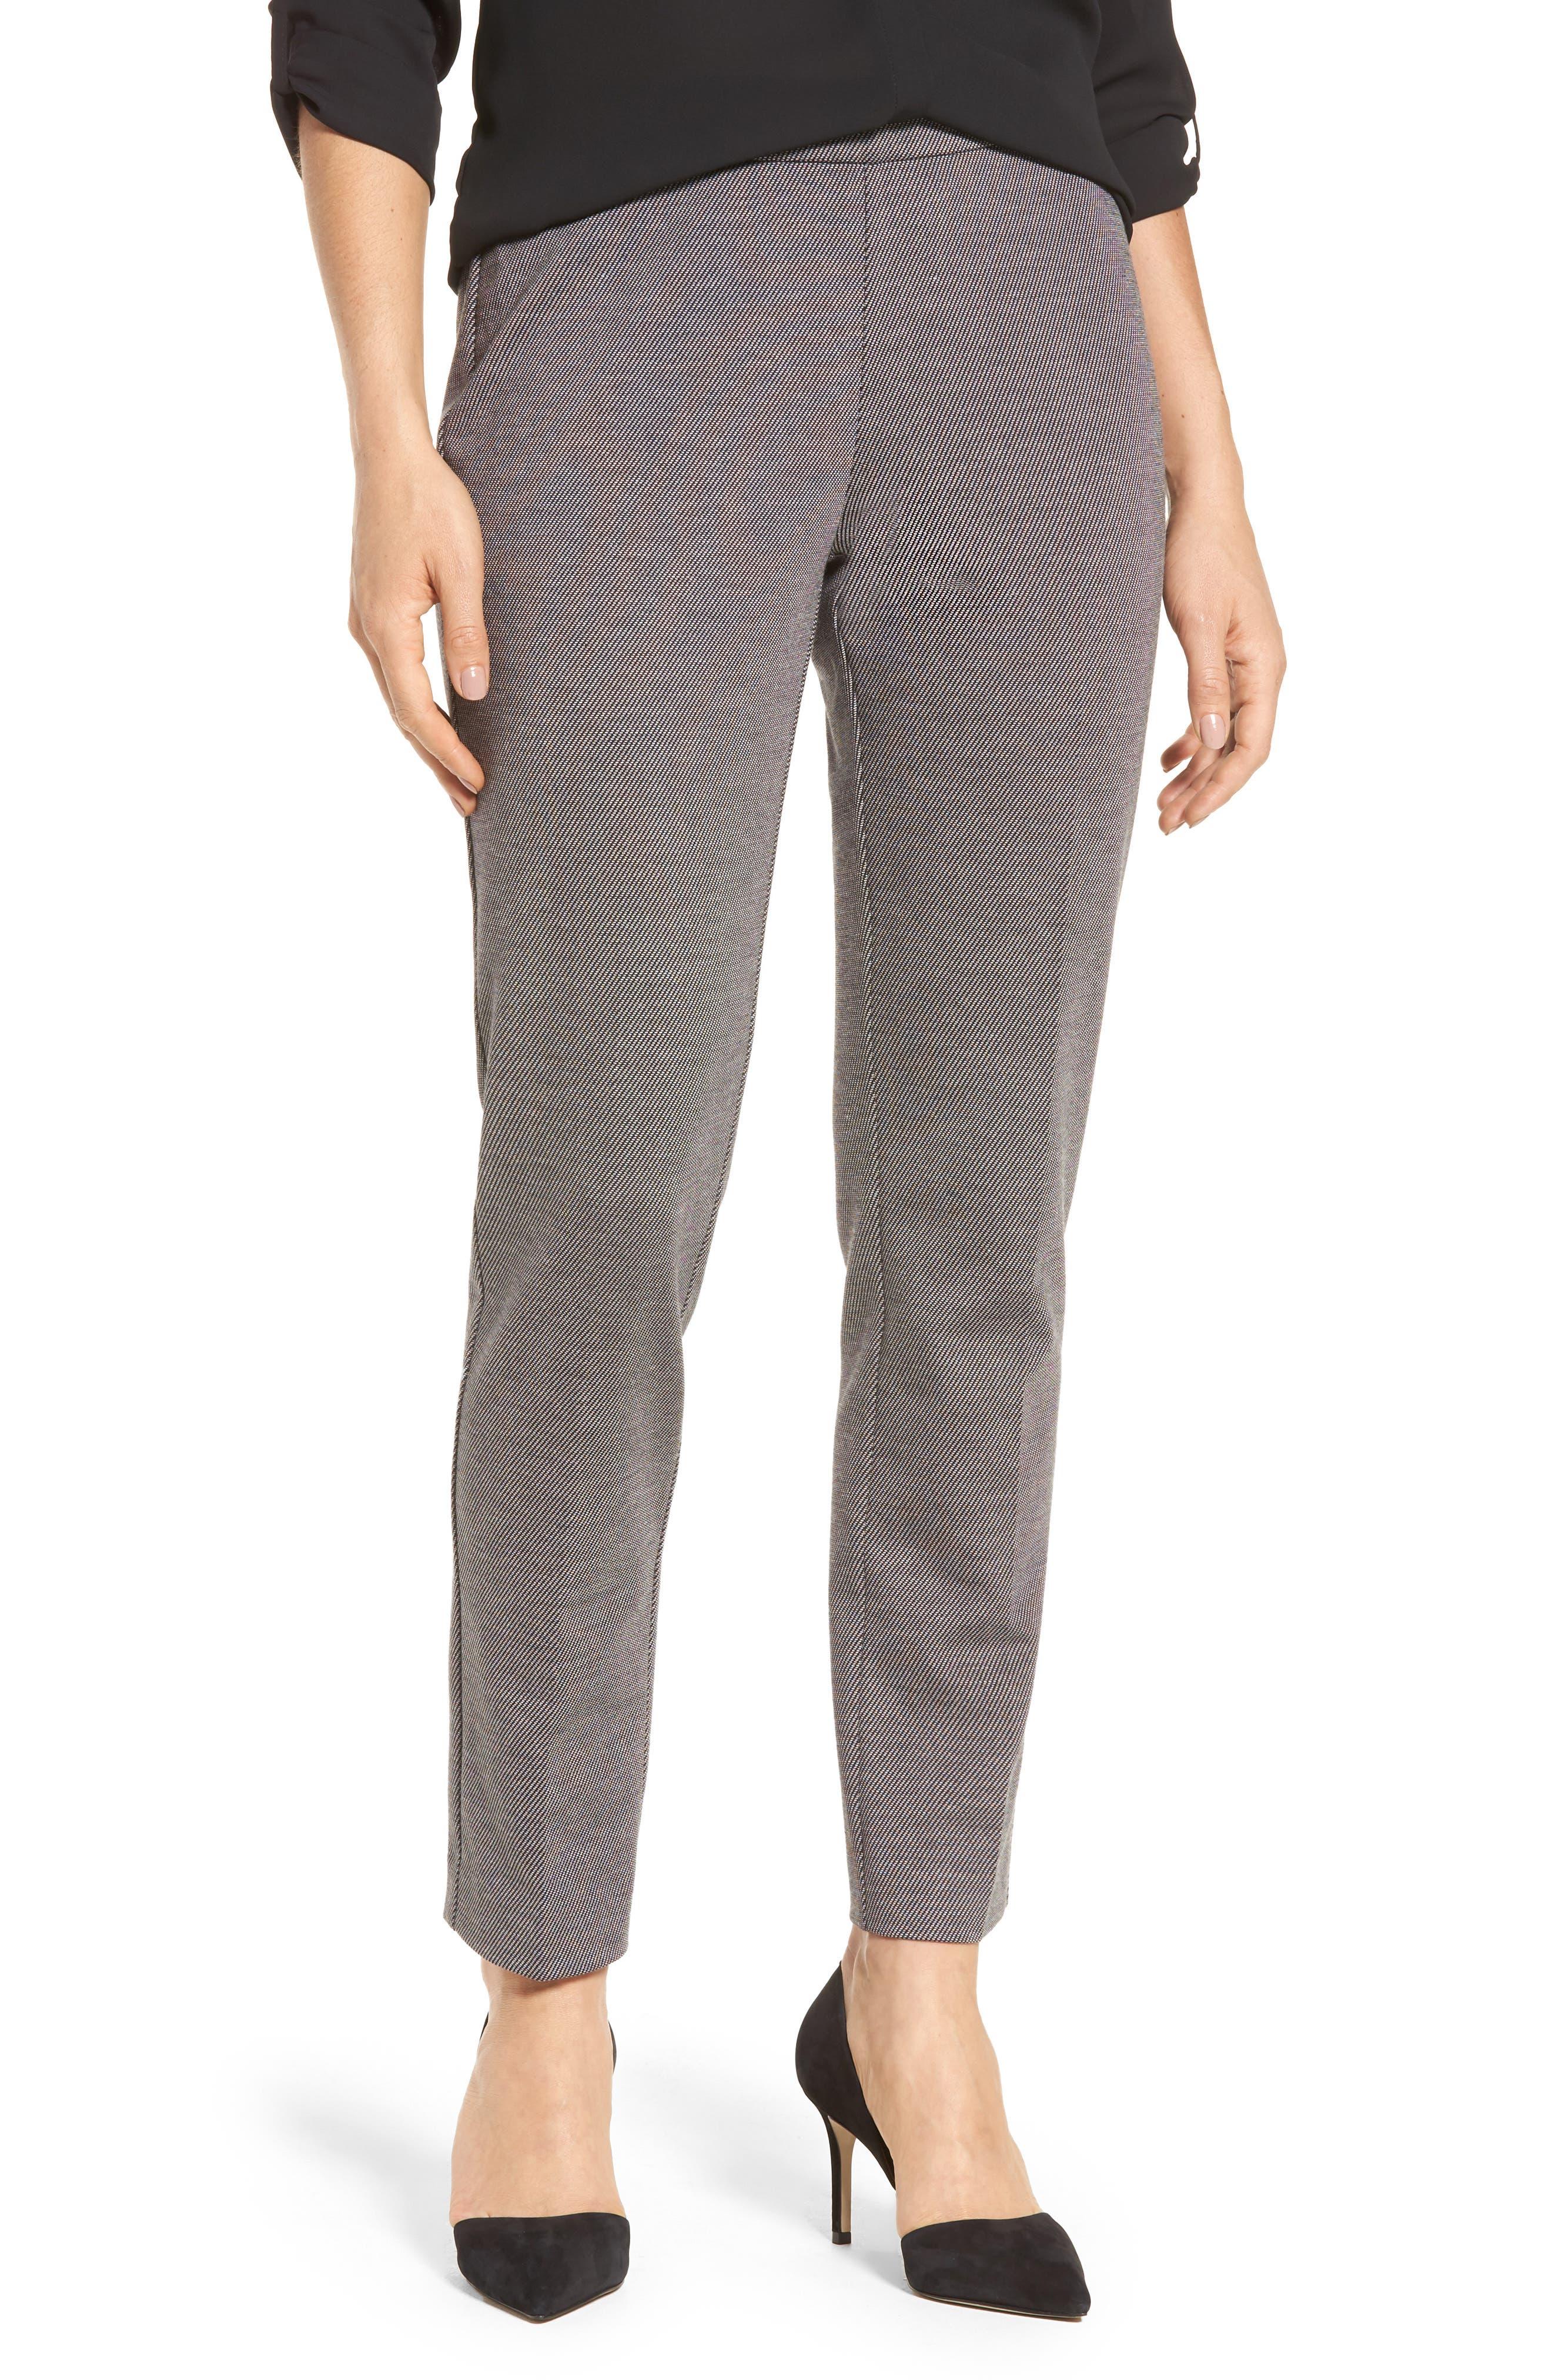 Slim Twill Ponte Knit Pants,                             Main thumbnail 1, color,                             020